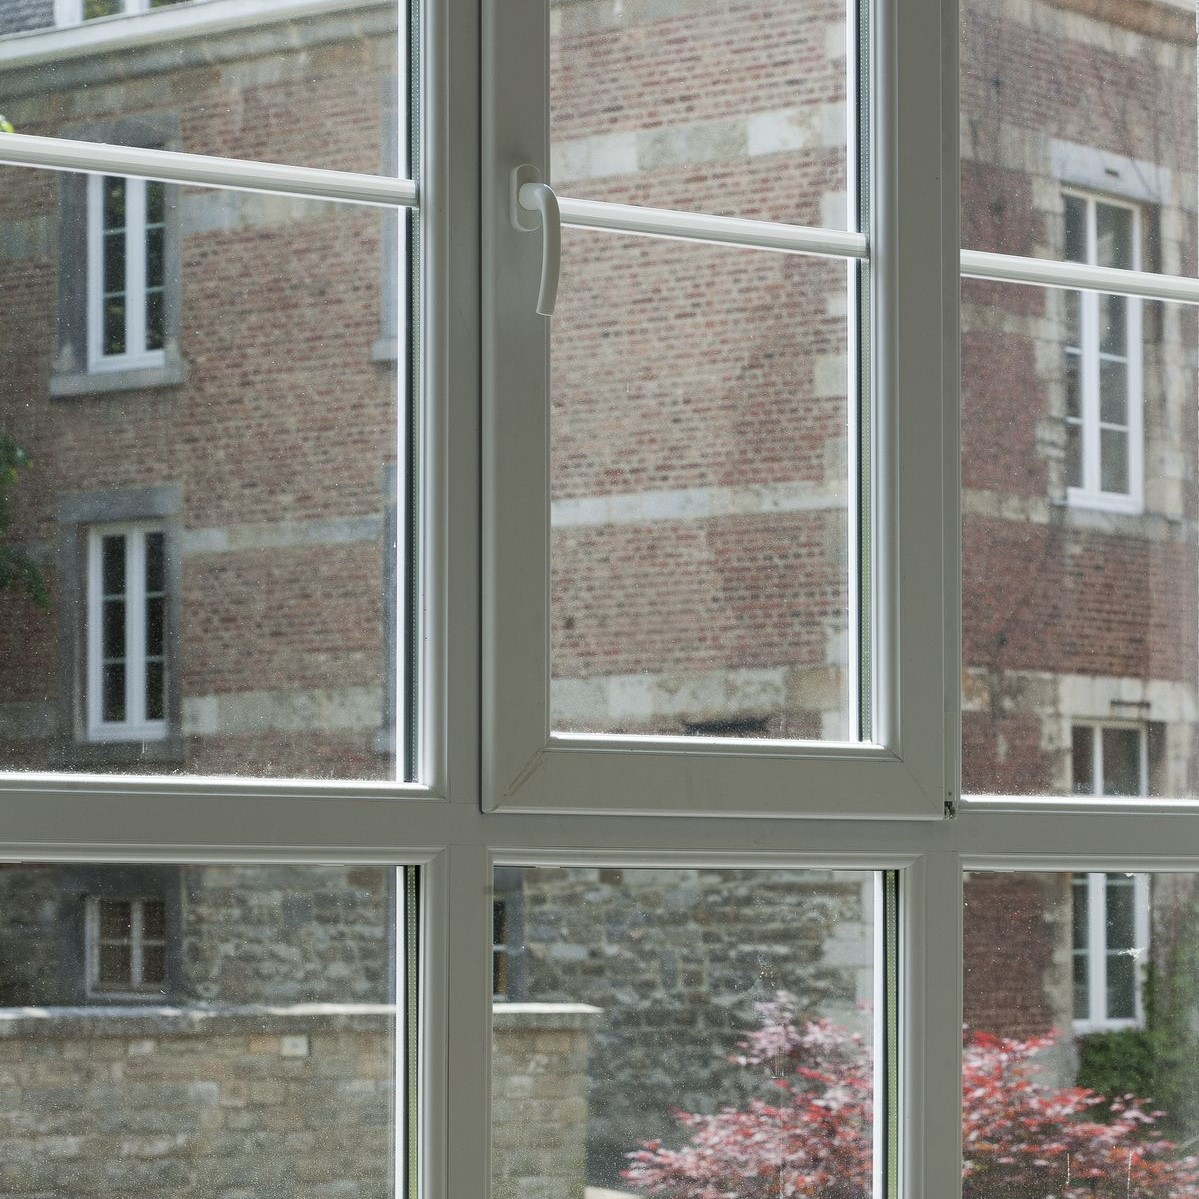 https://climalit.es/blog/wp-content/uploads/2018/06/Collège-Saint-Roch_97699.jpg